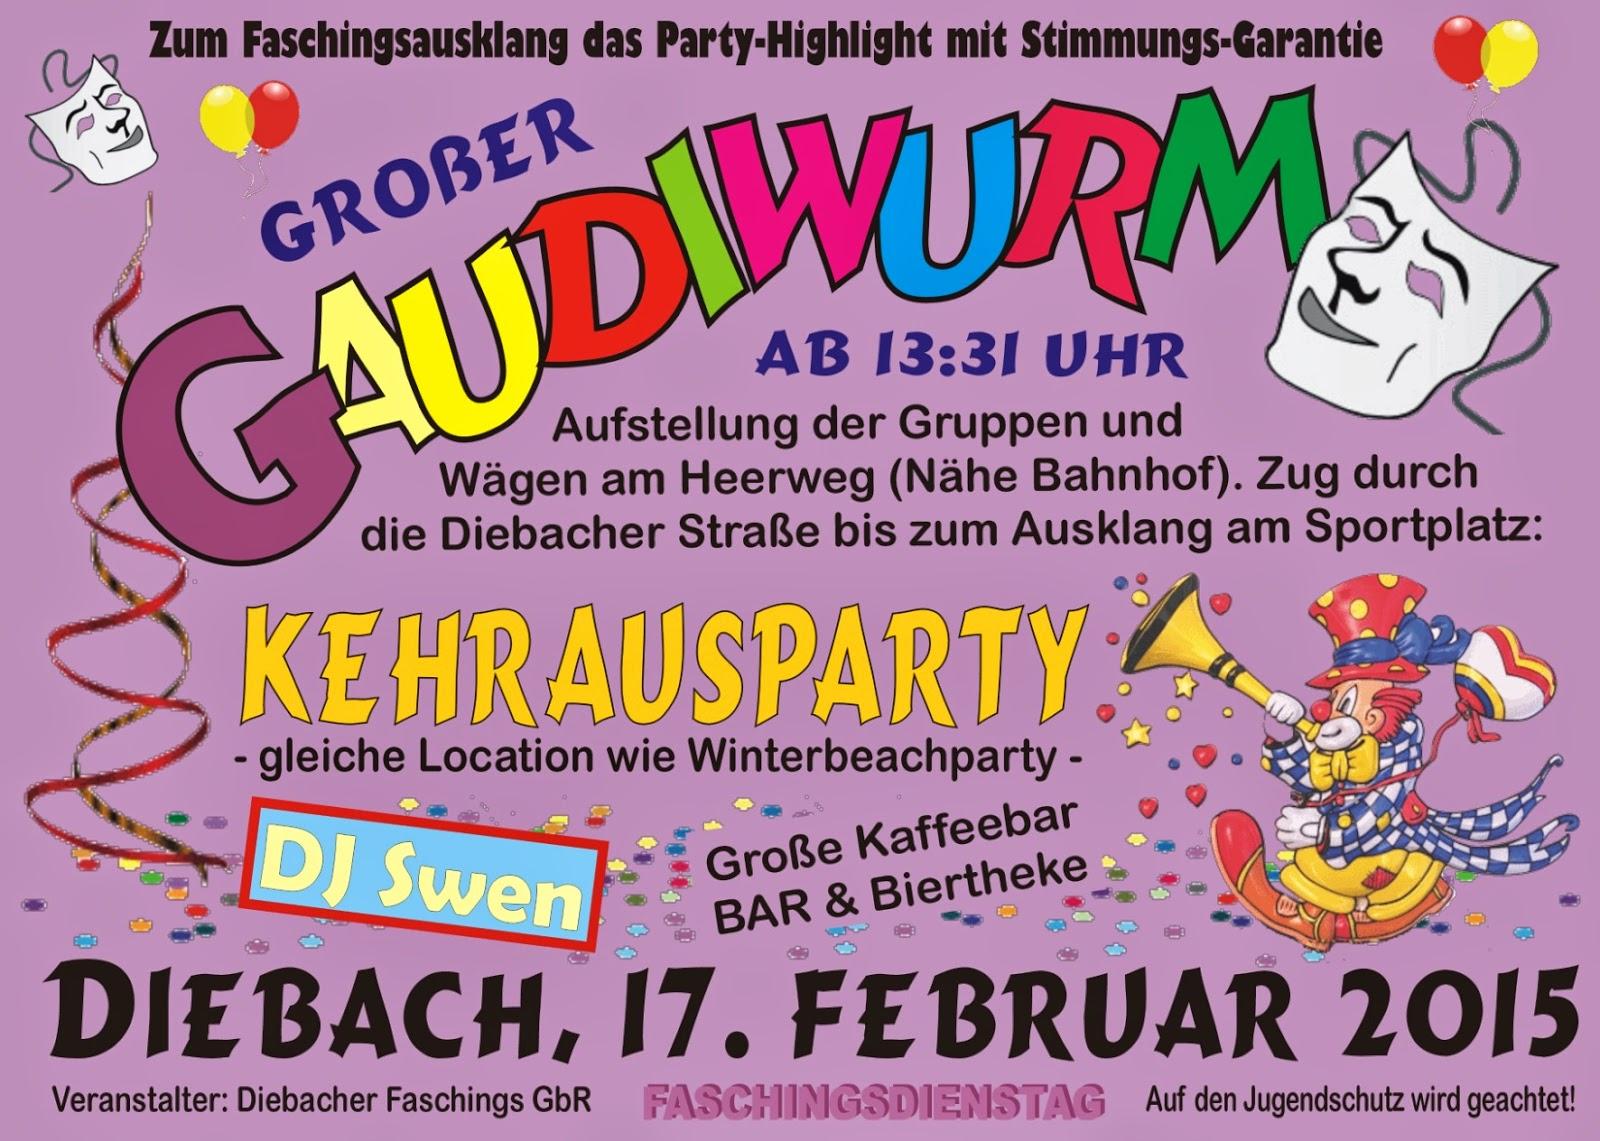 http://www.geomix.at/verein/sc-diebach/news/gaudiwurm-2015-158099